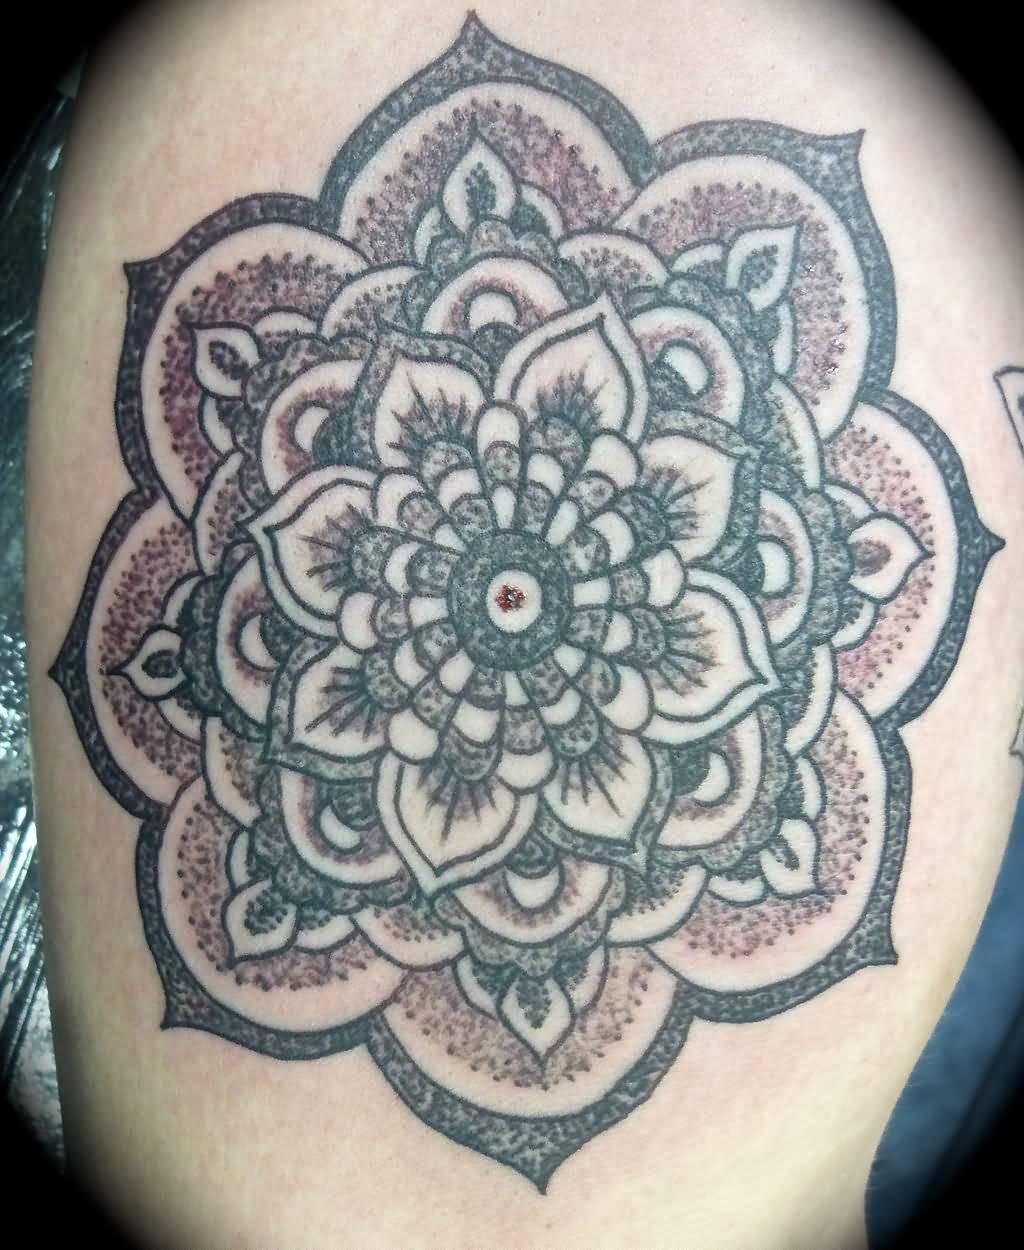 Mandala And Flower Tattoo: Awesome Mandala Flower Tattoo Idea